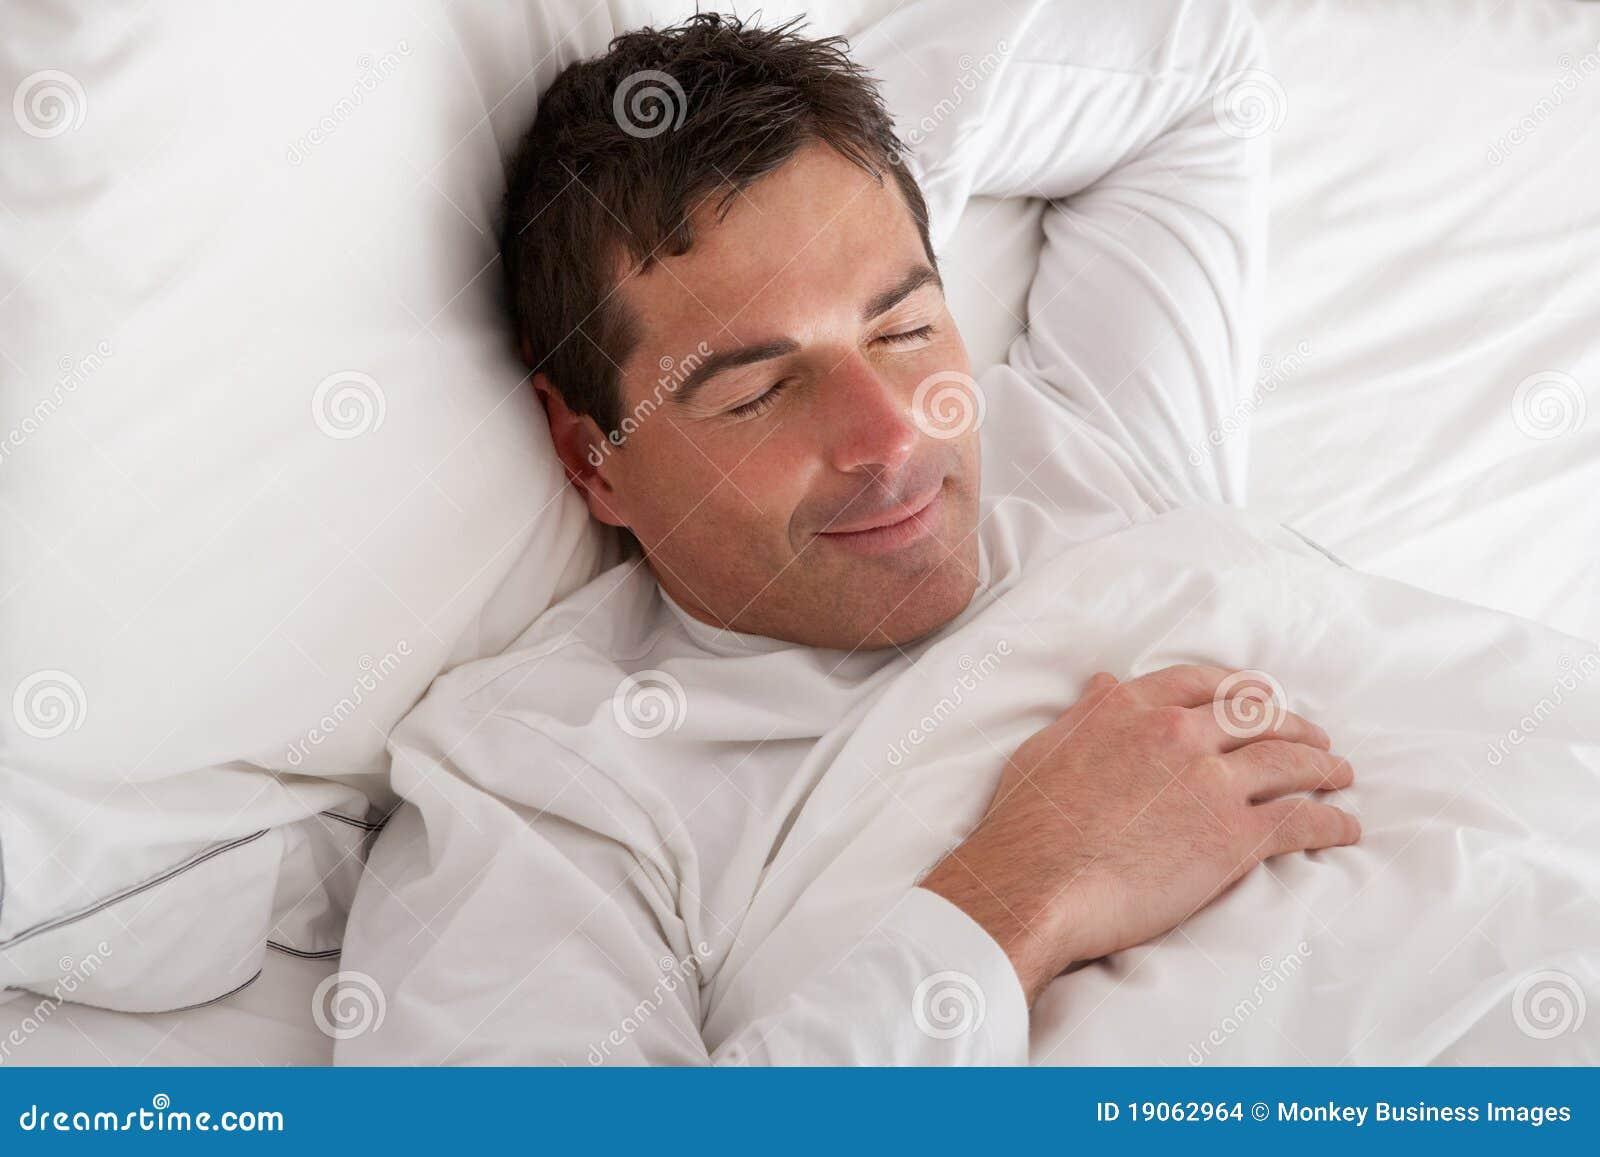 Monkey Sleeping On A Bed